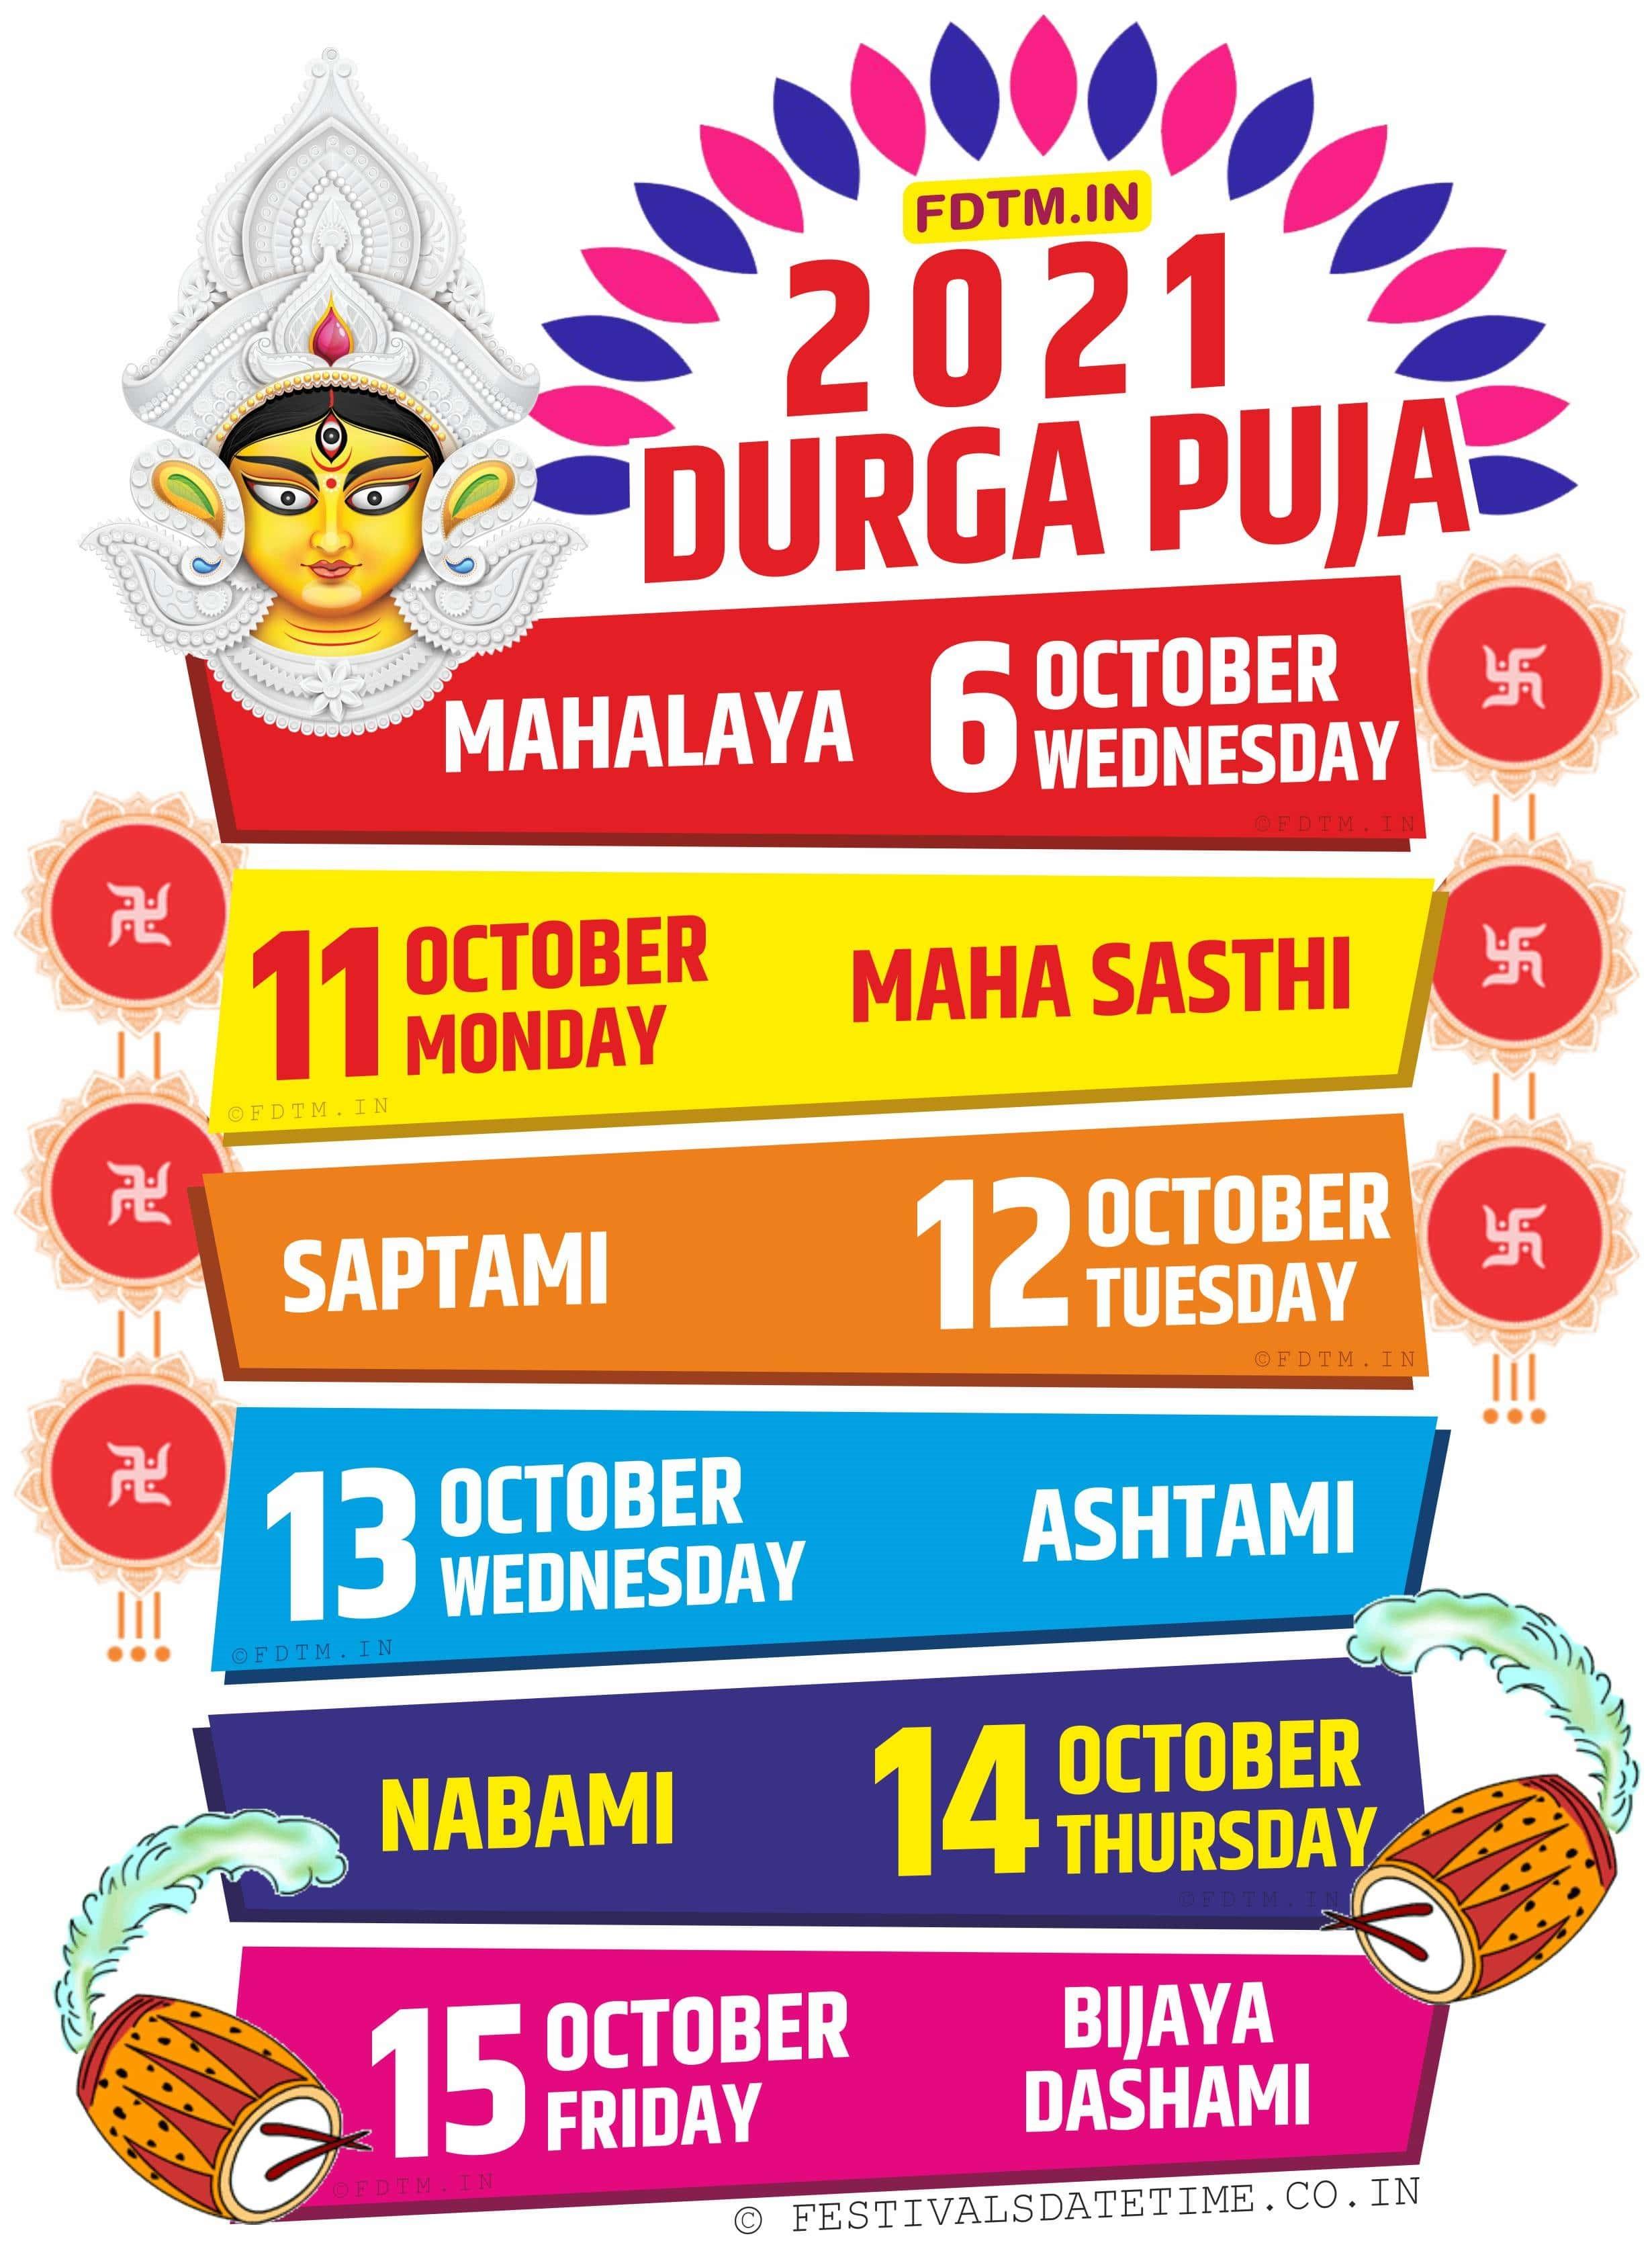 2021 Durga Puja Date and Time Schedule, 2021 Durga Puja in Kolkata